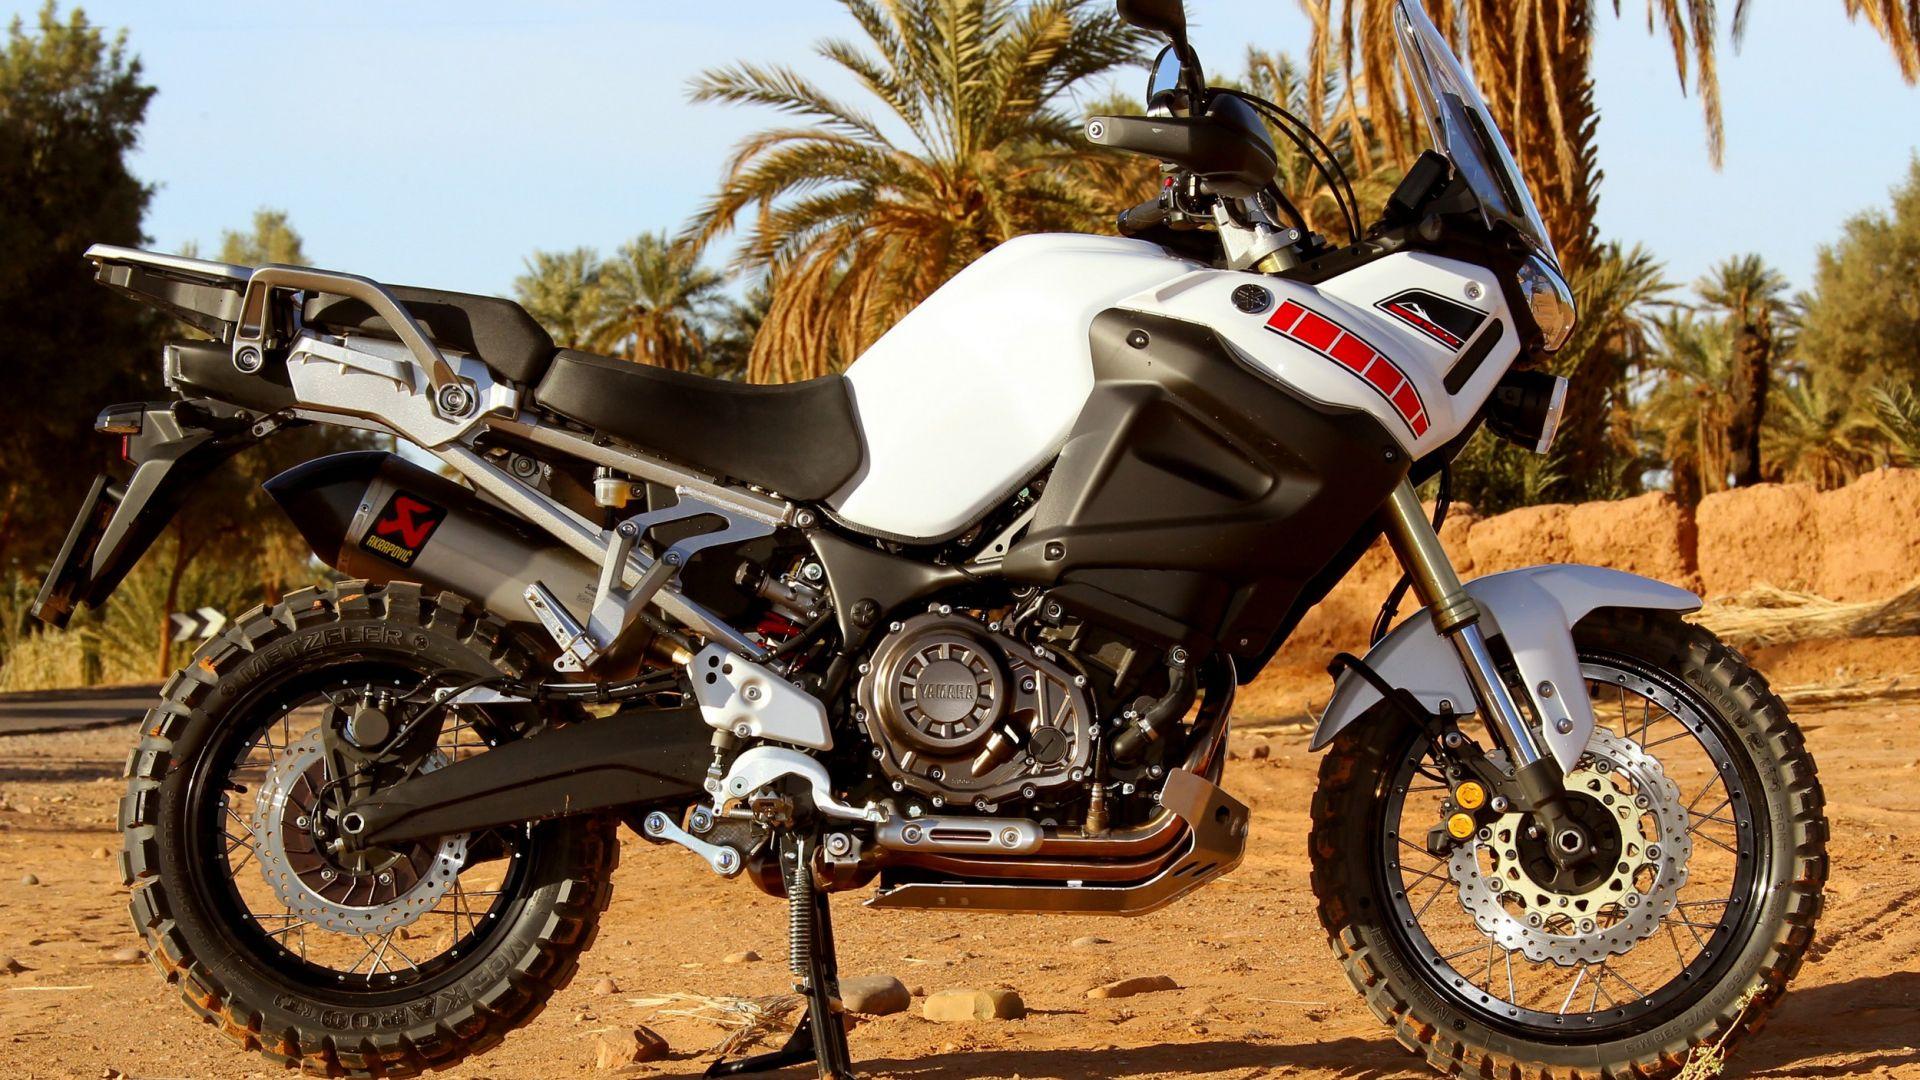 Immagine 3: In Marocco con la Yamaha Super Ténéré